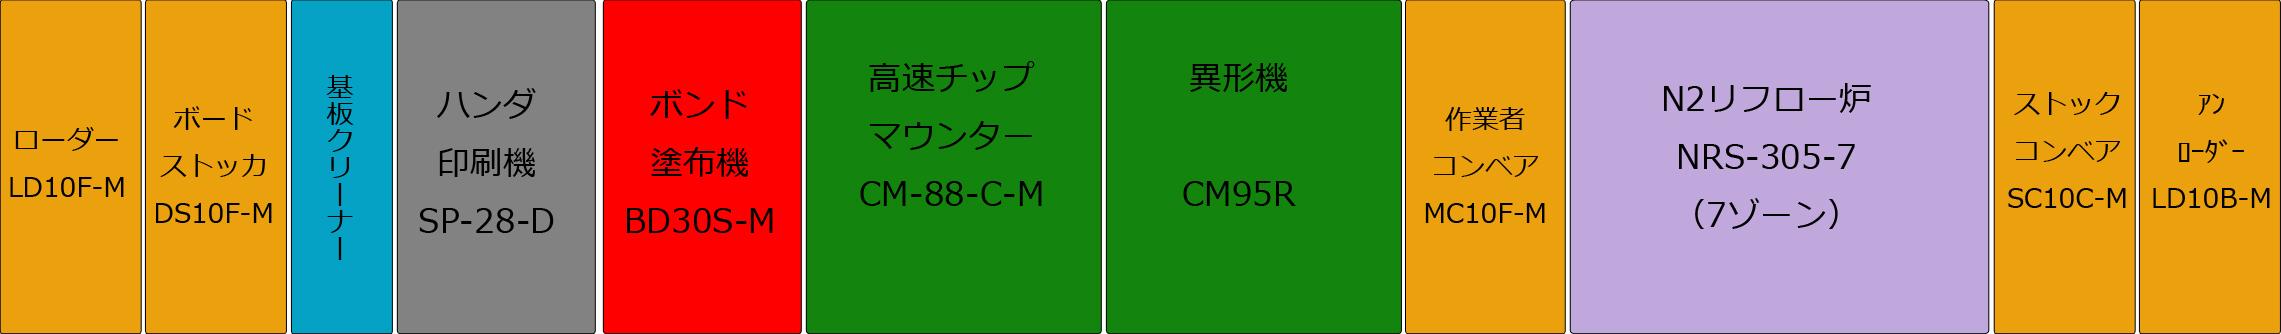 SMT実装設備(2号機)